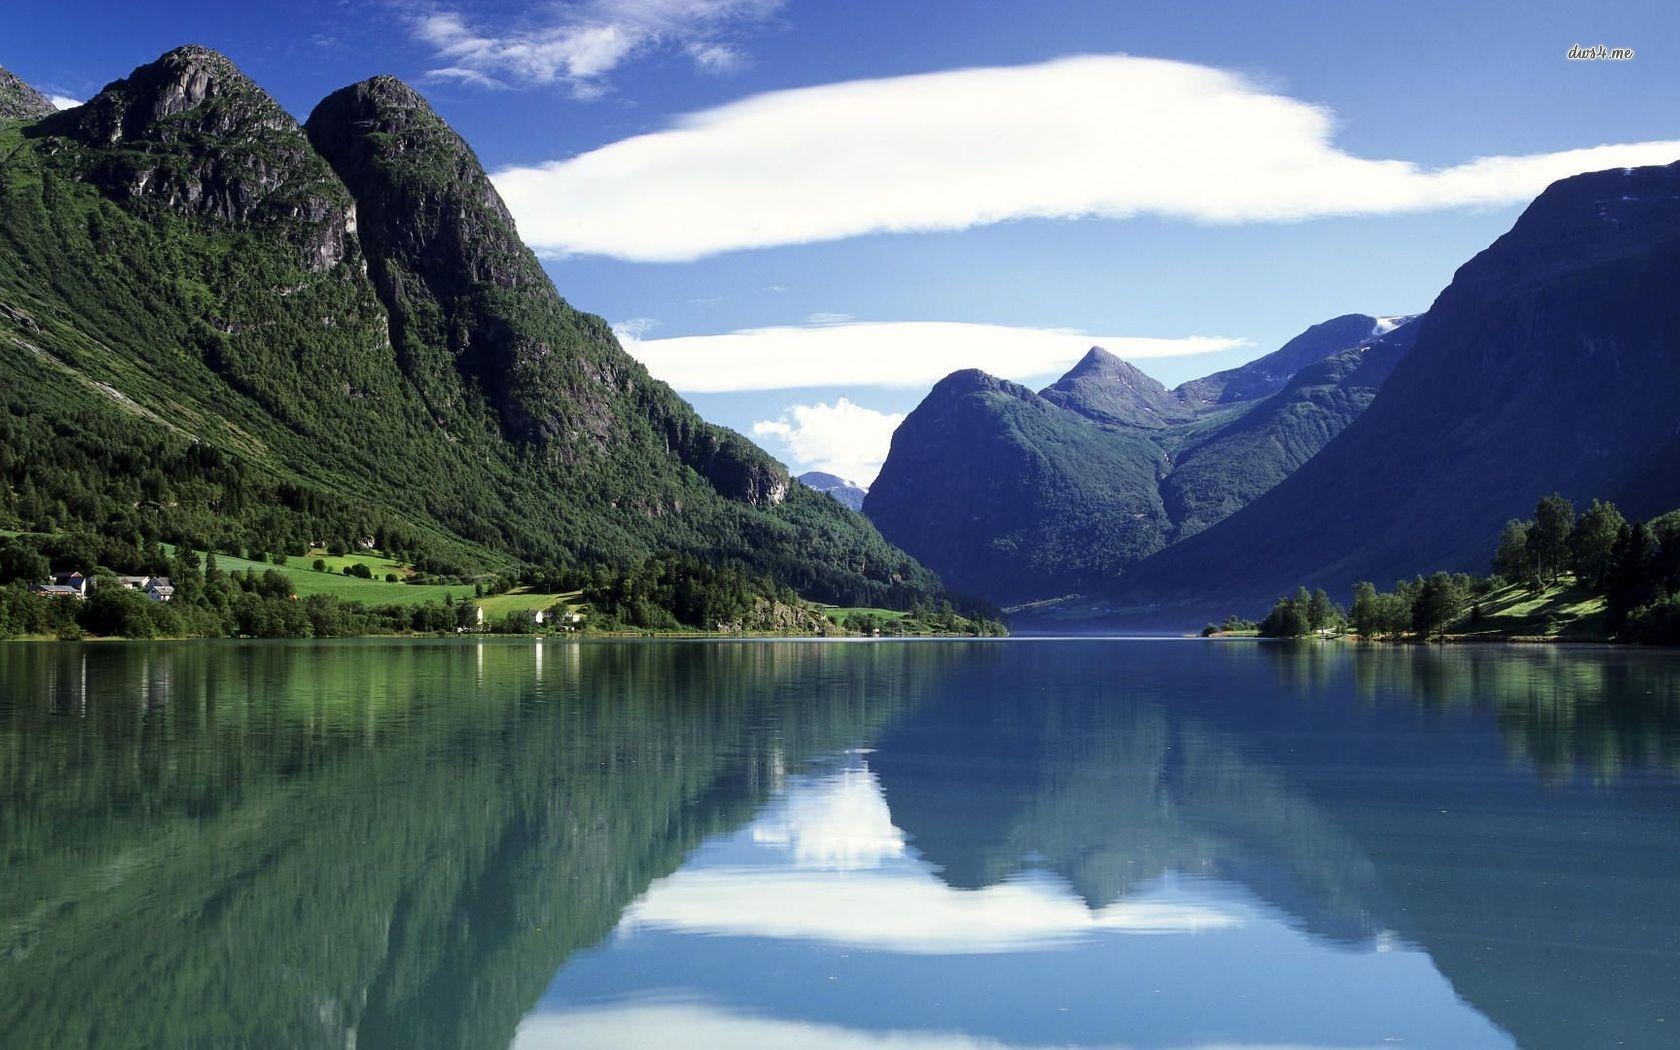 nature photo wallpaper,natural landscape,mountainous landforms,nature,body of water,mountain